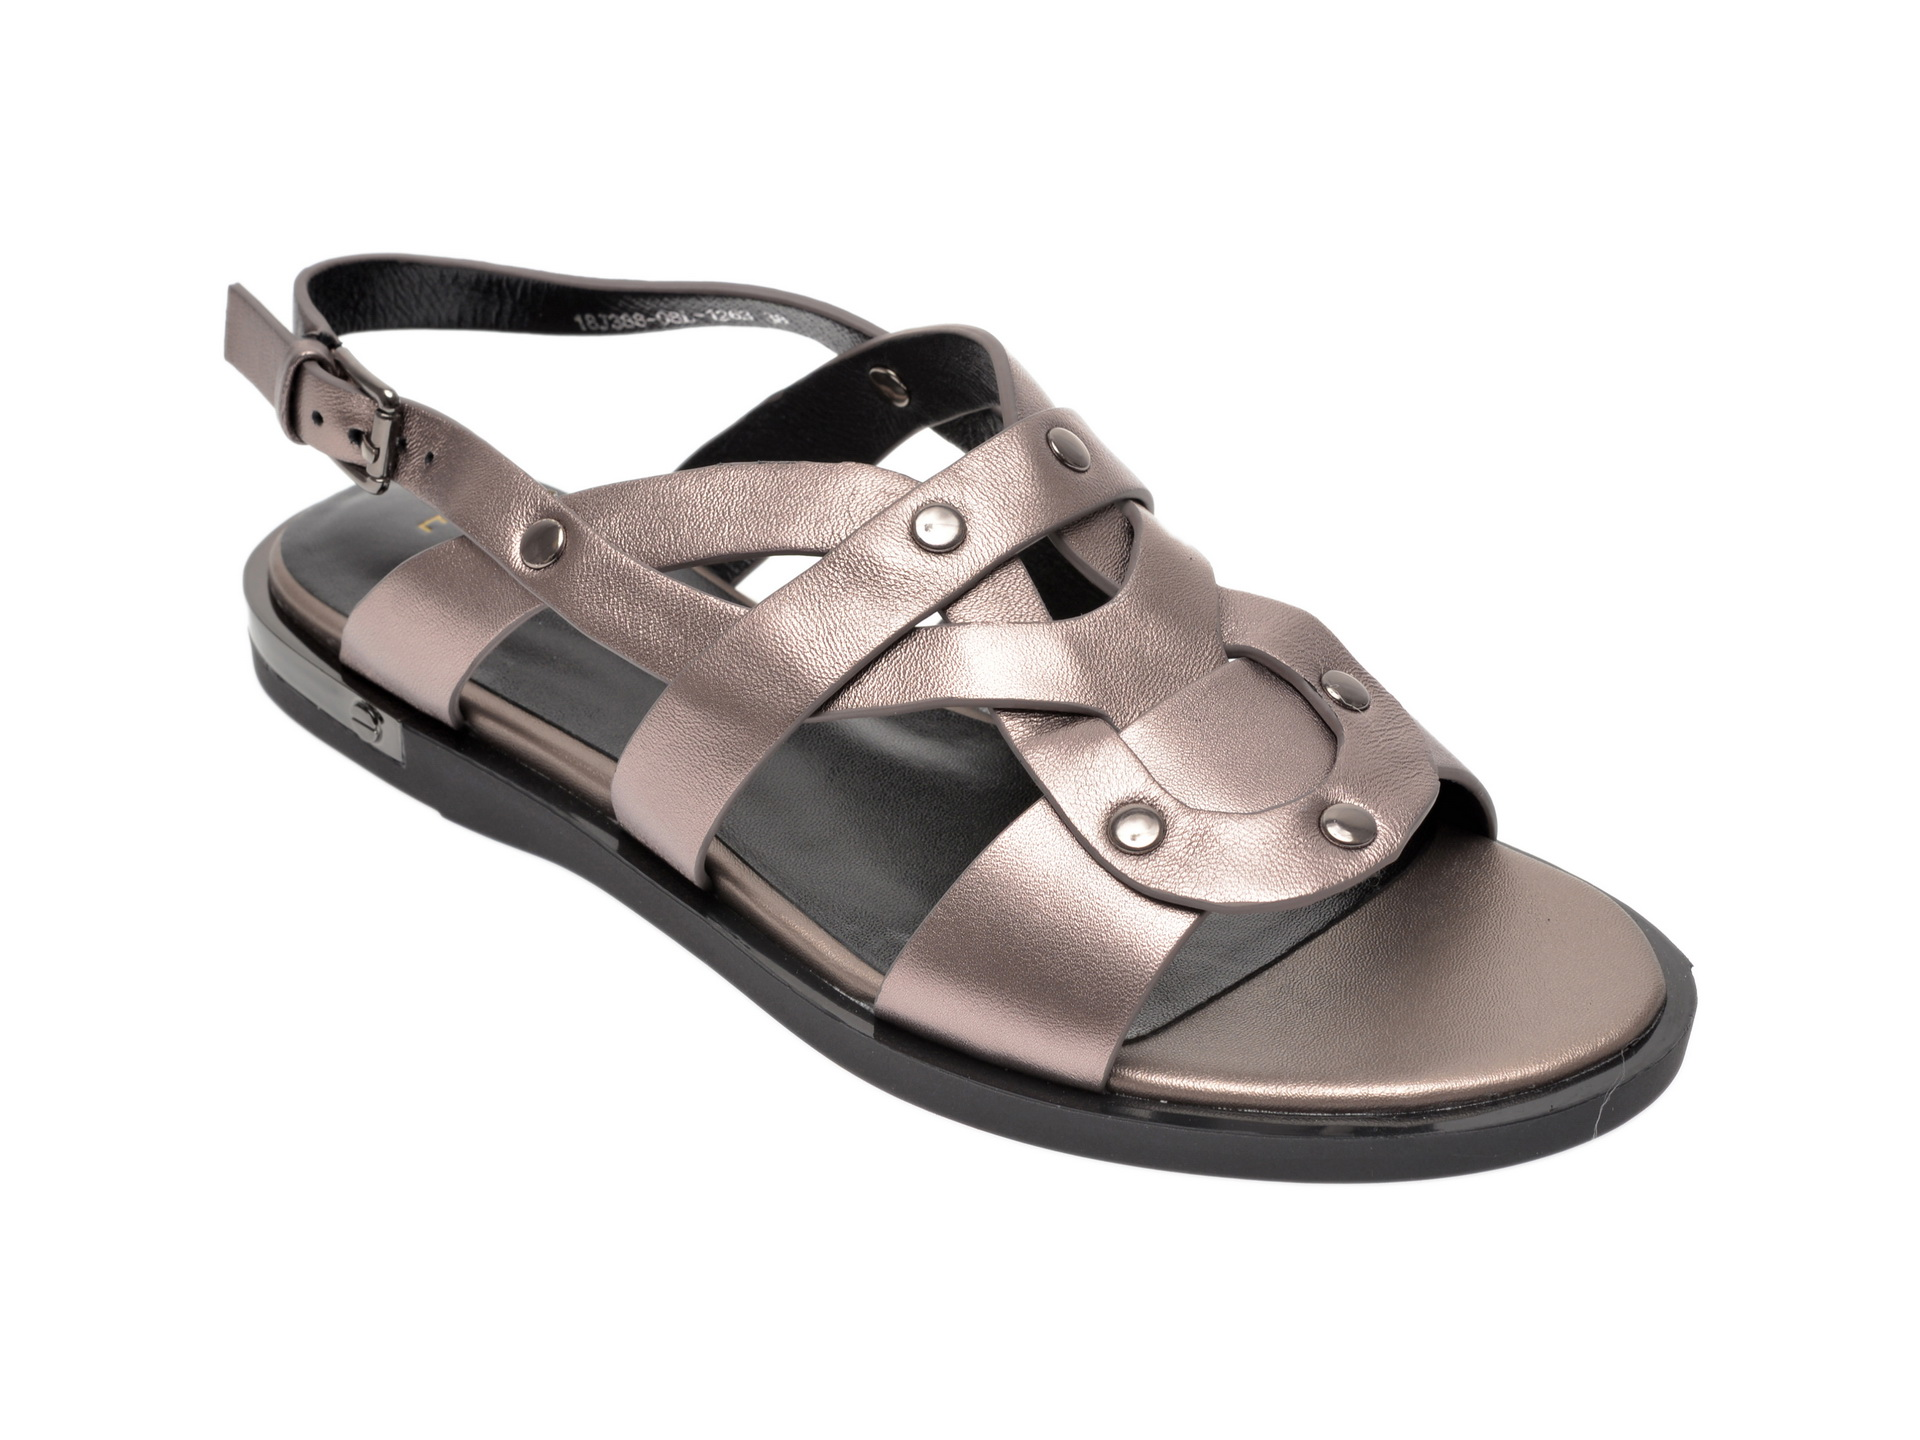 Sandale EPICA gri, 18J3880, din piele naturala imagine